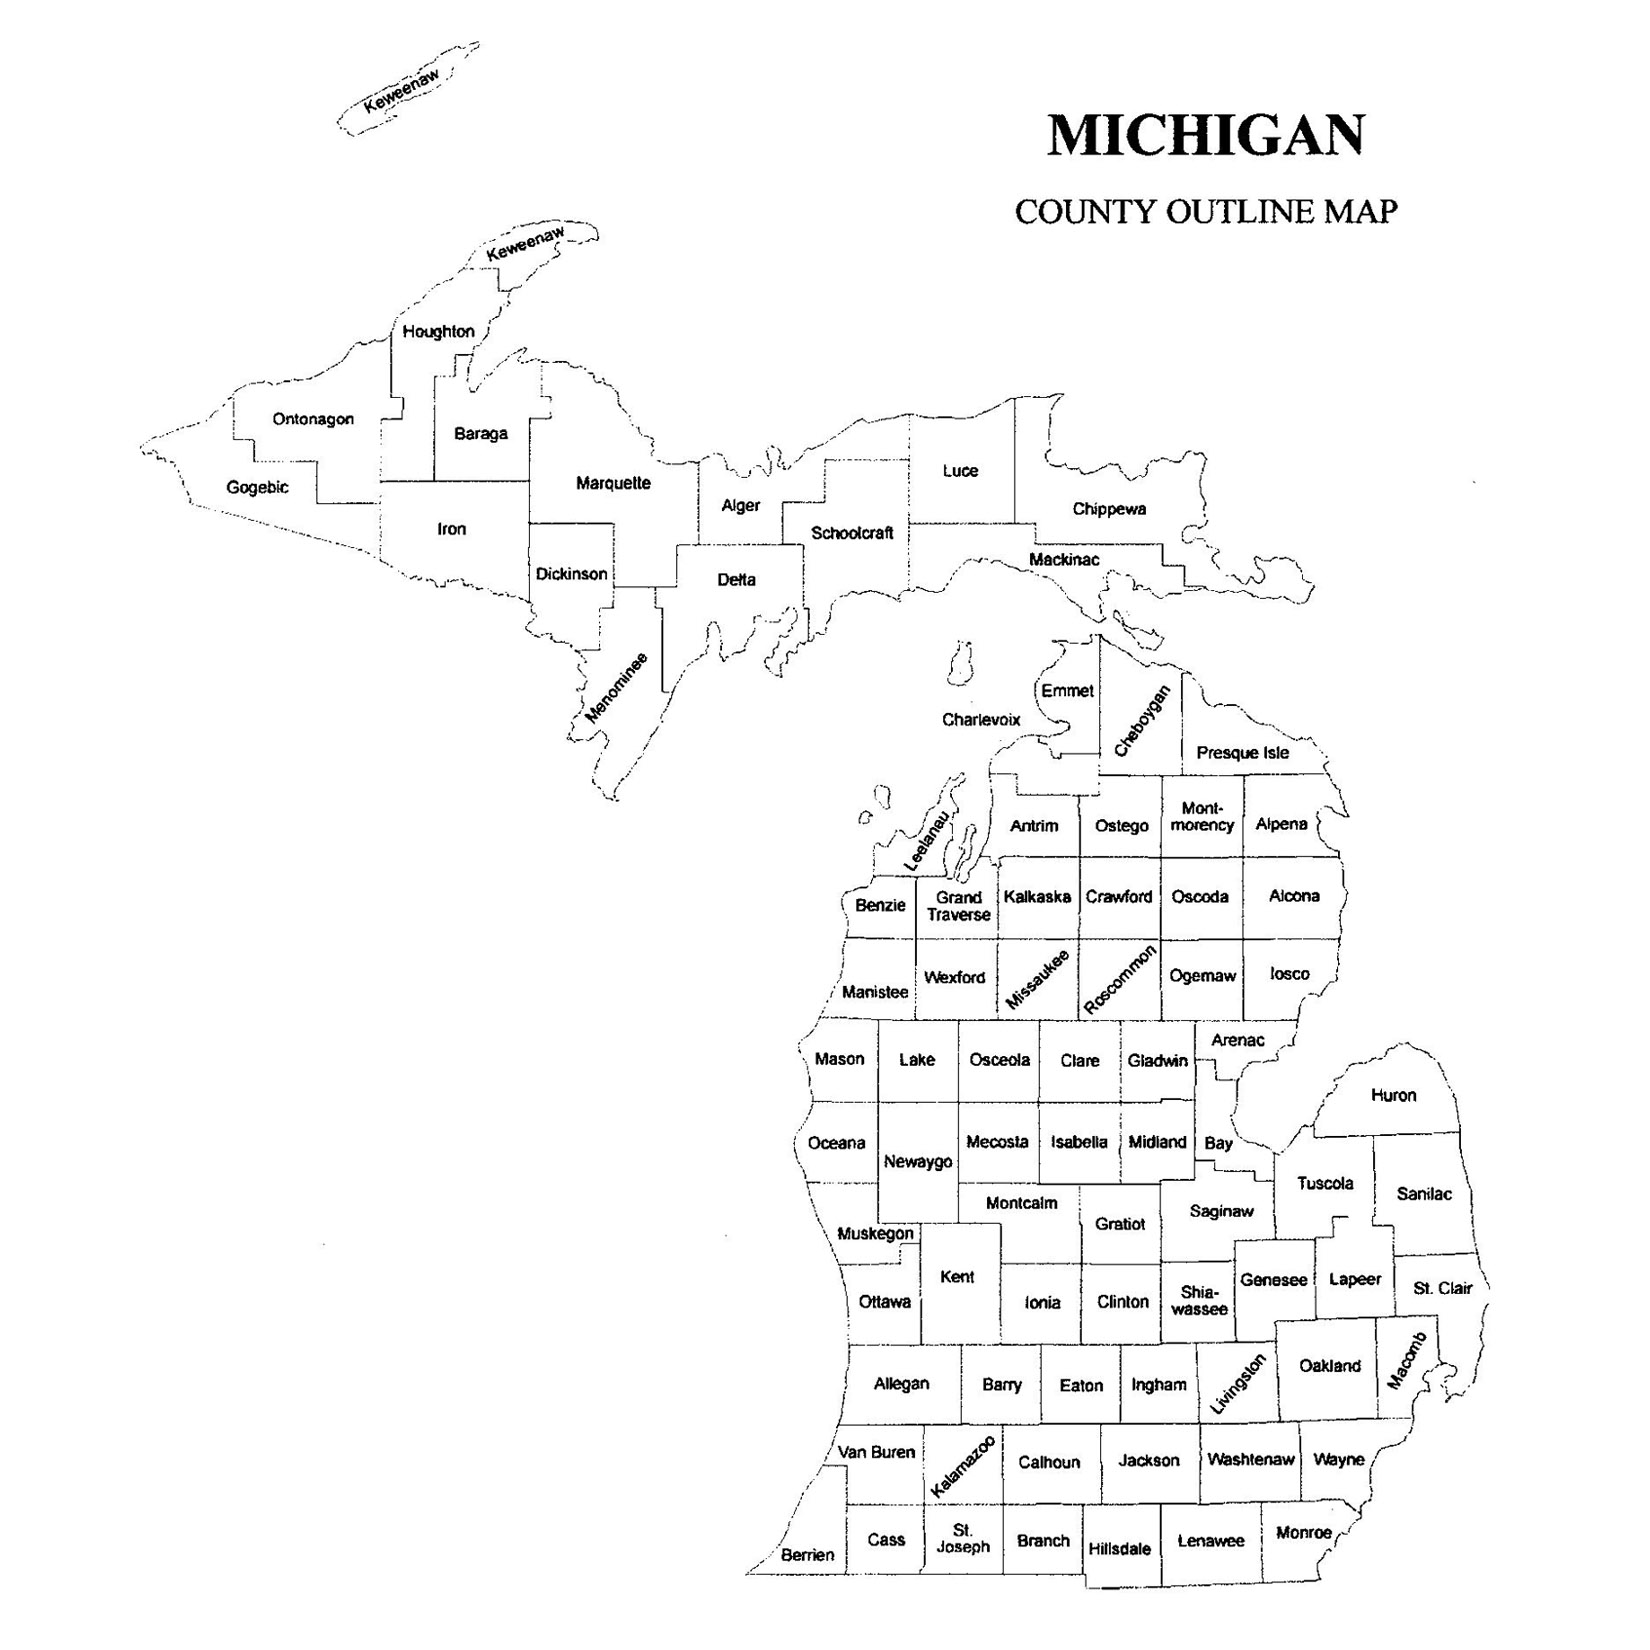 Michigan County Map Michigan County Map – Jigsaw Genealogy Michigan County Map